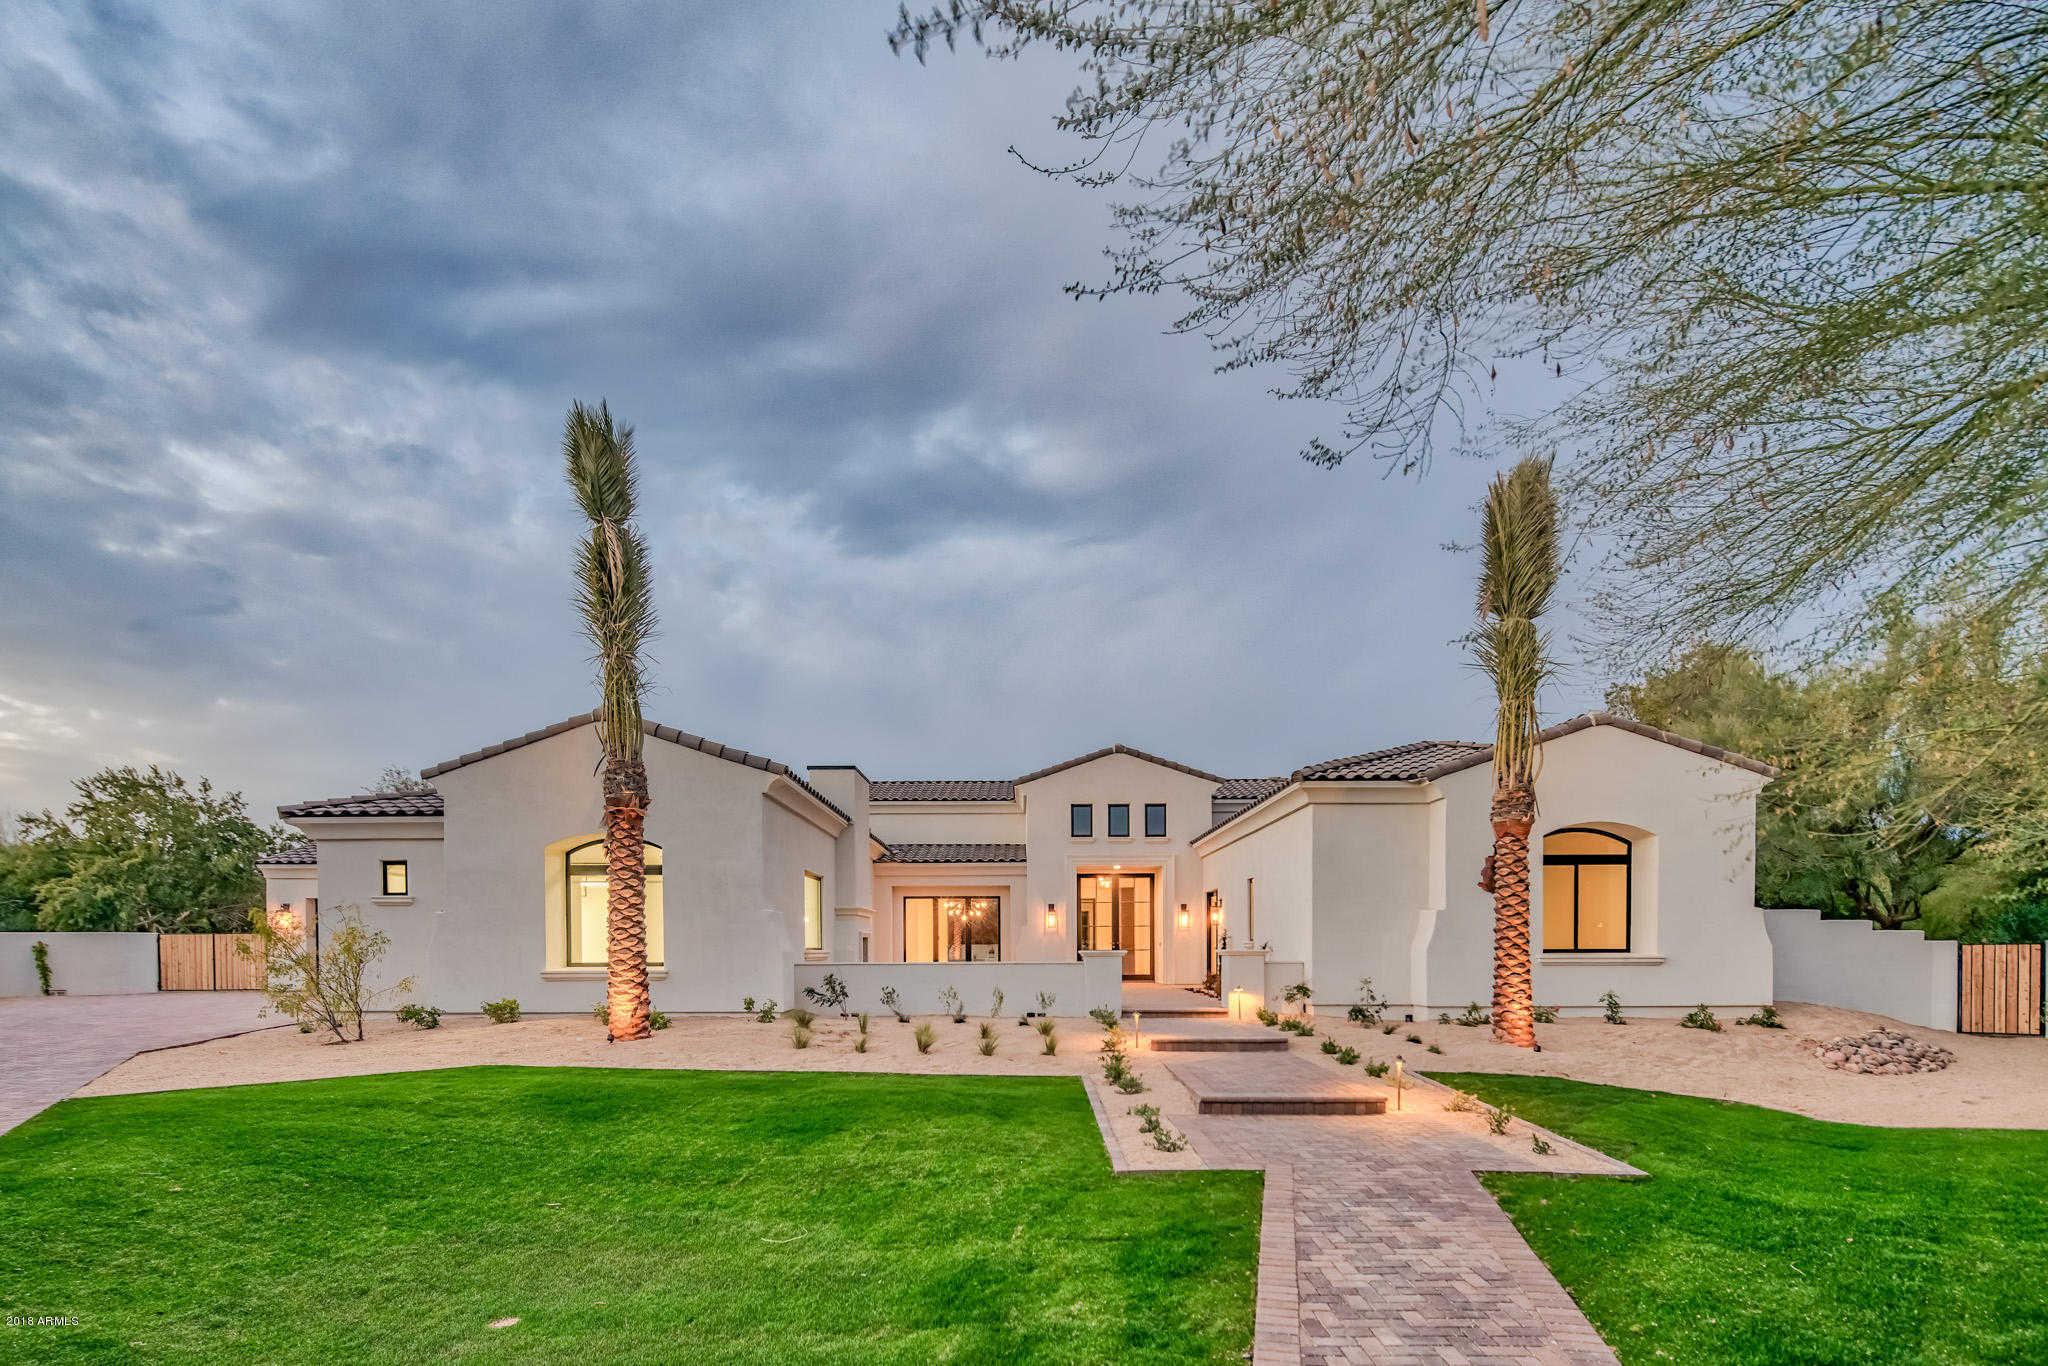 $3,250,000 - 5Br/6Ba - Home for Sale in Mockingbird Lane Estates, Paradise Valley